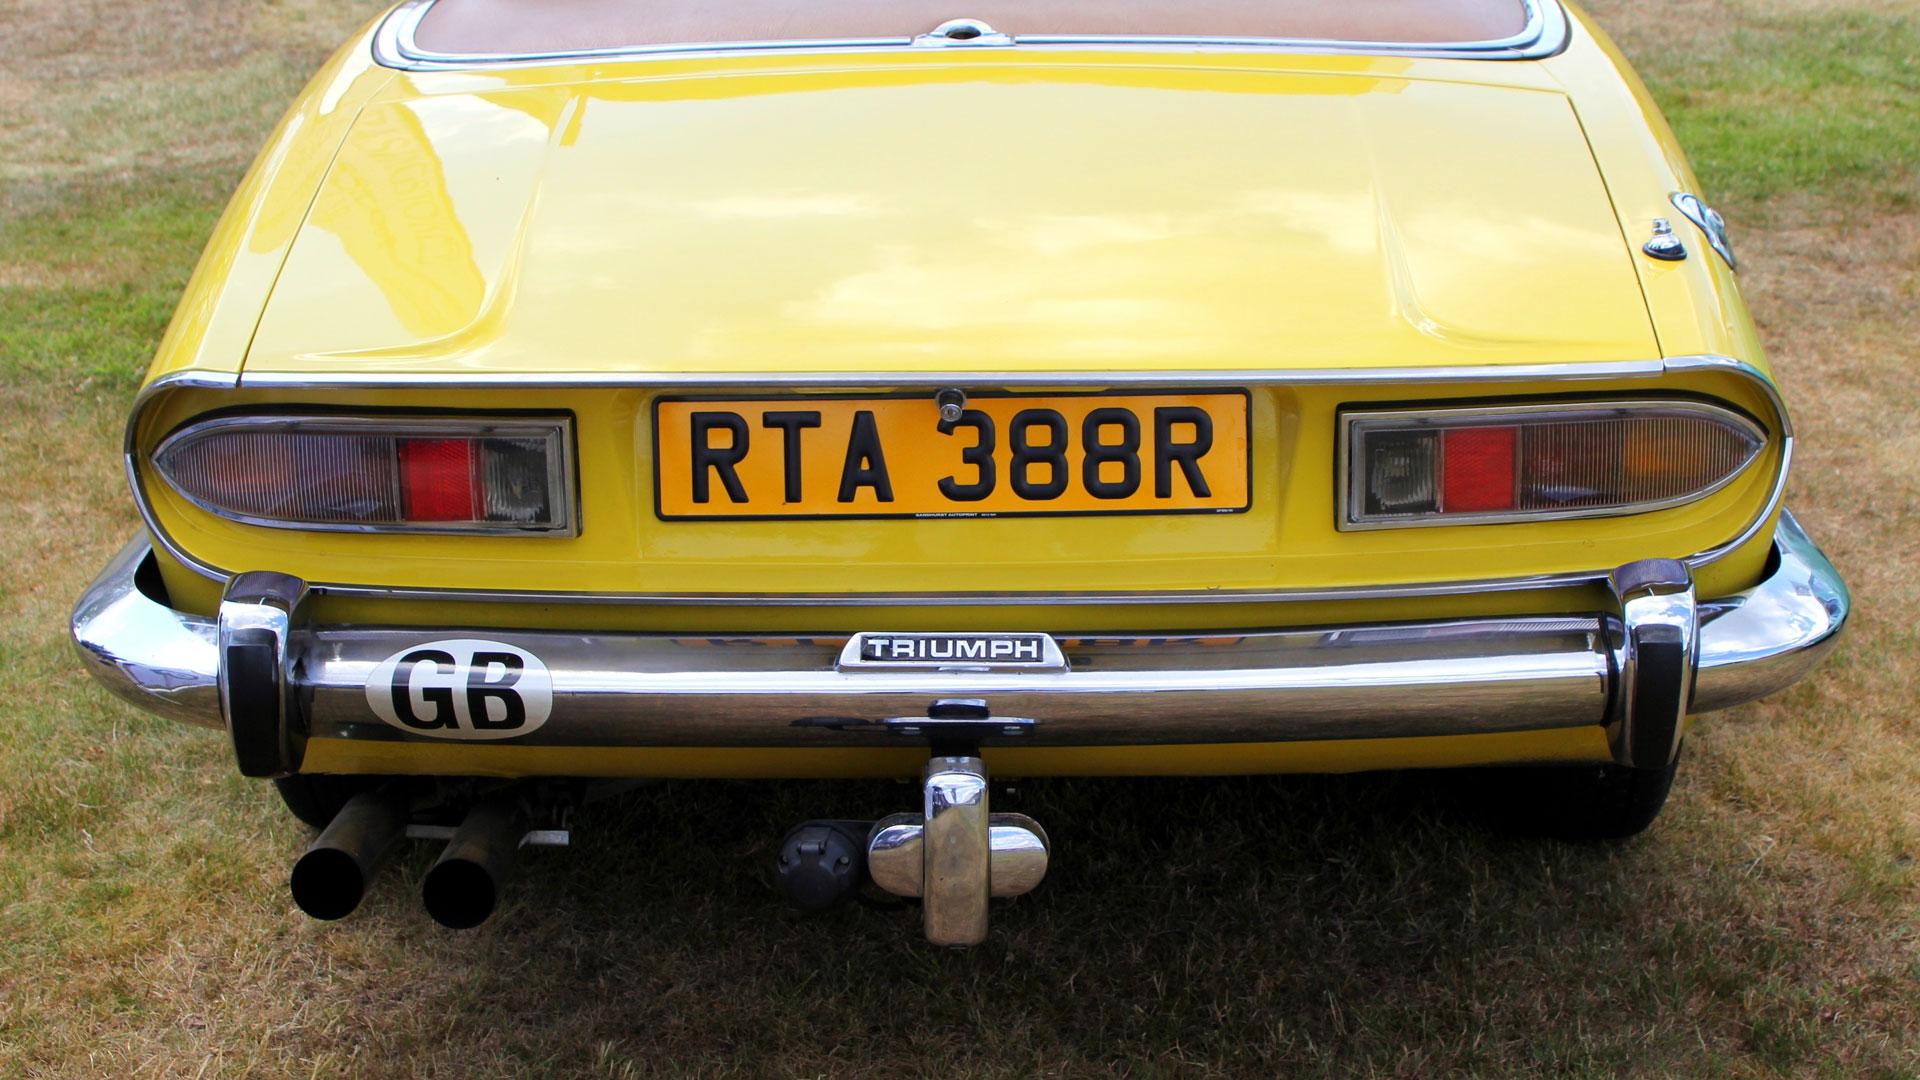 GB sticker on Triumph Stag